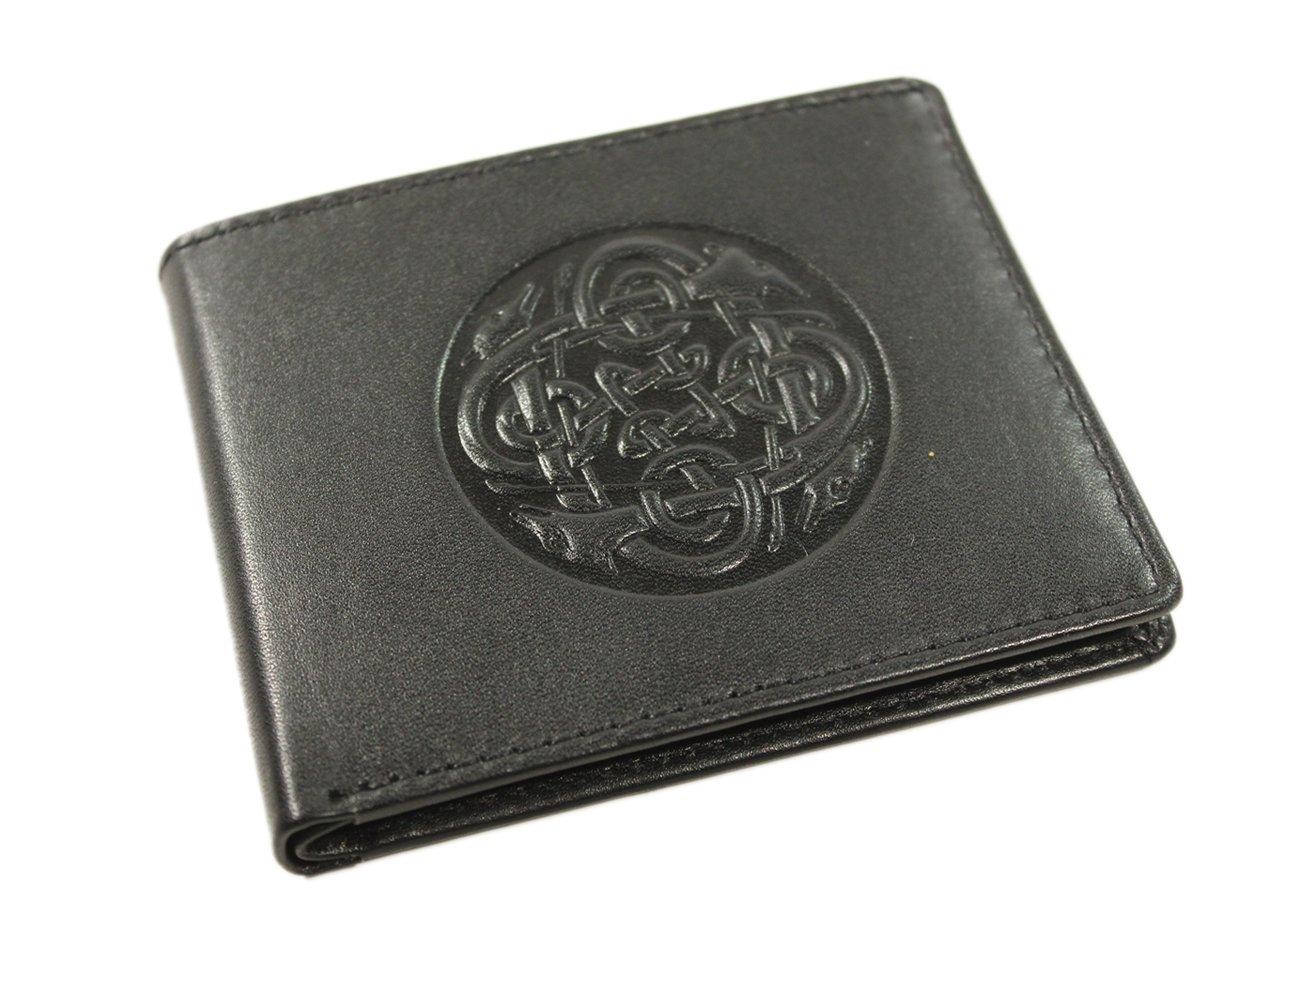 Irish Leather Wallet Black Celtic Wolf Hound Design Ireland Made